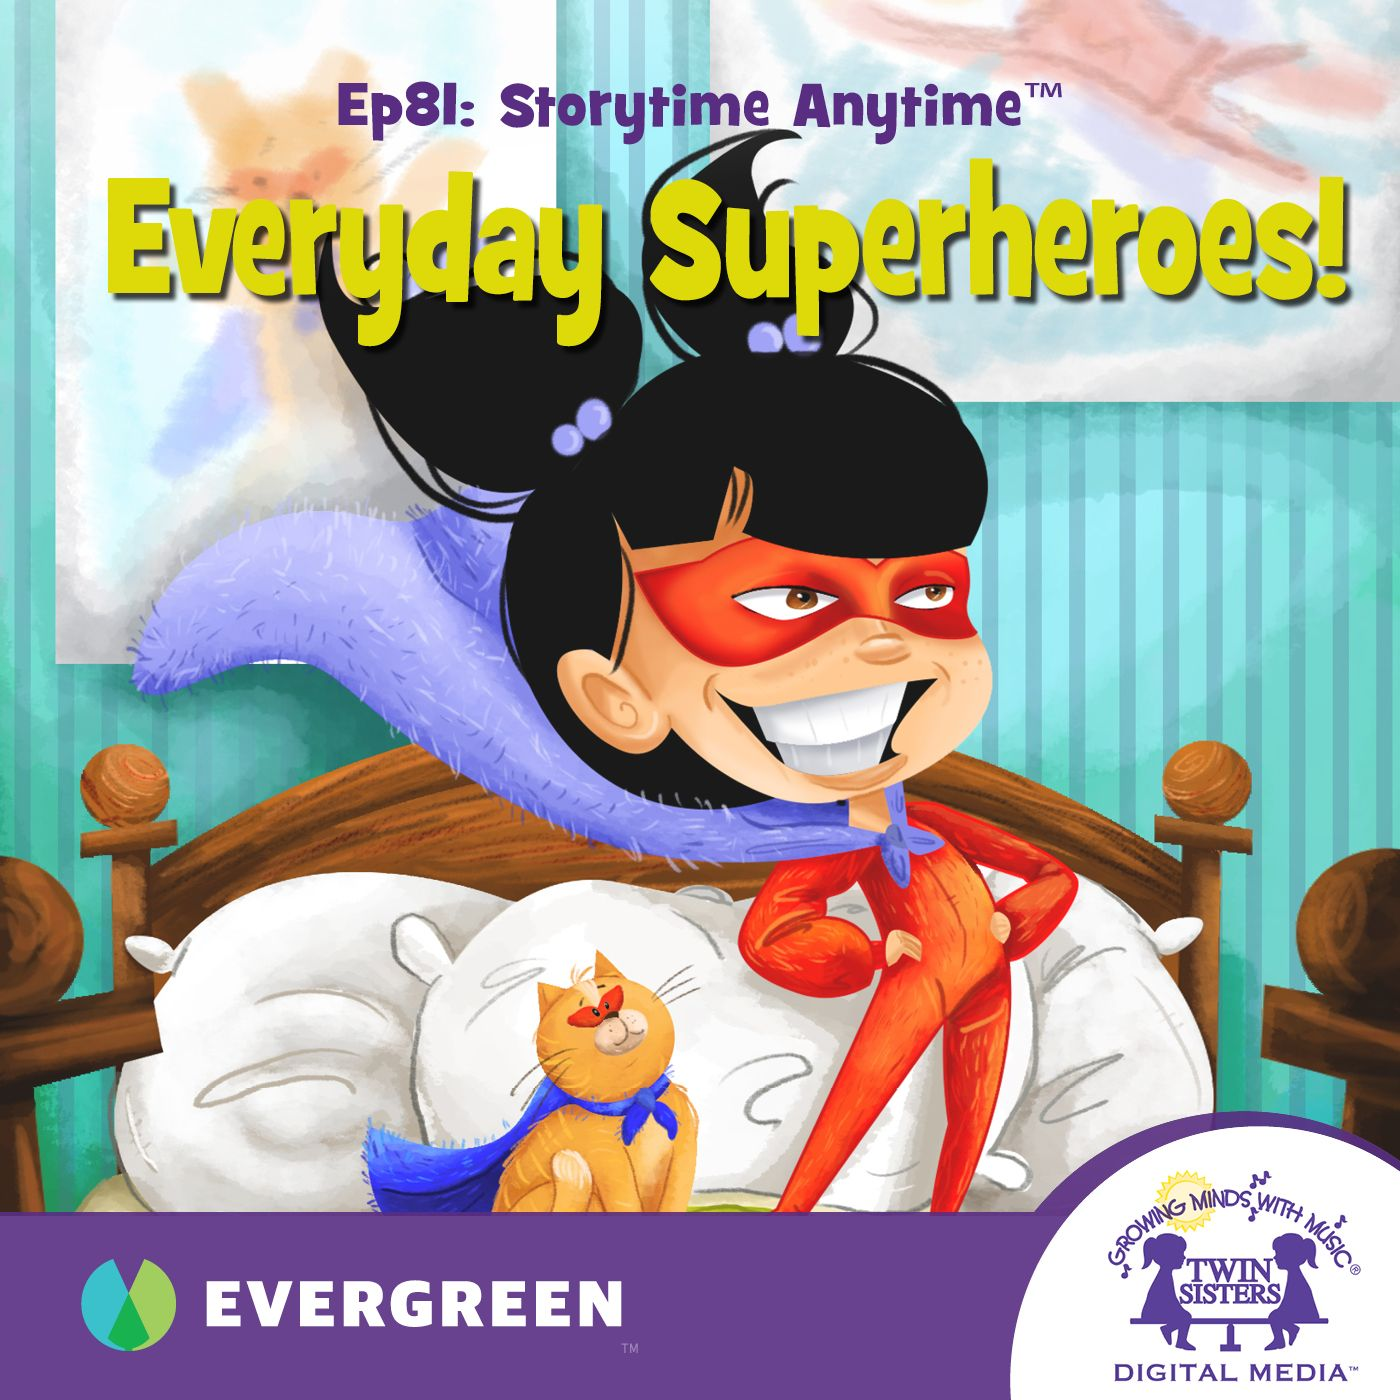 Everyday Superheroes!